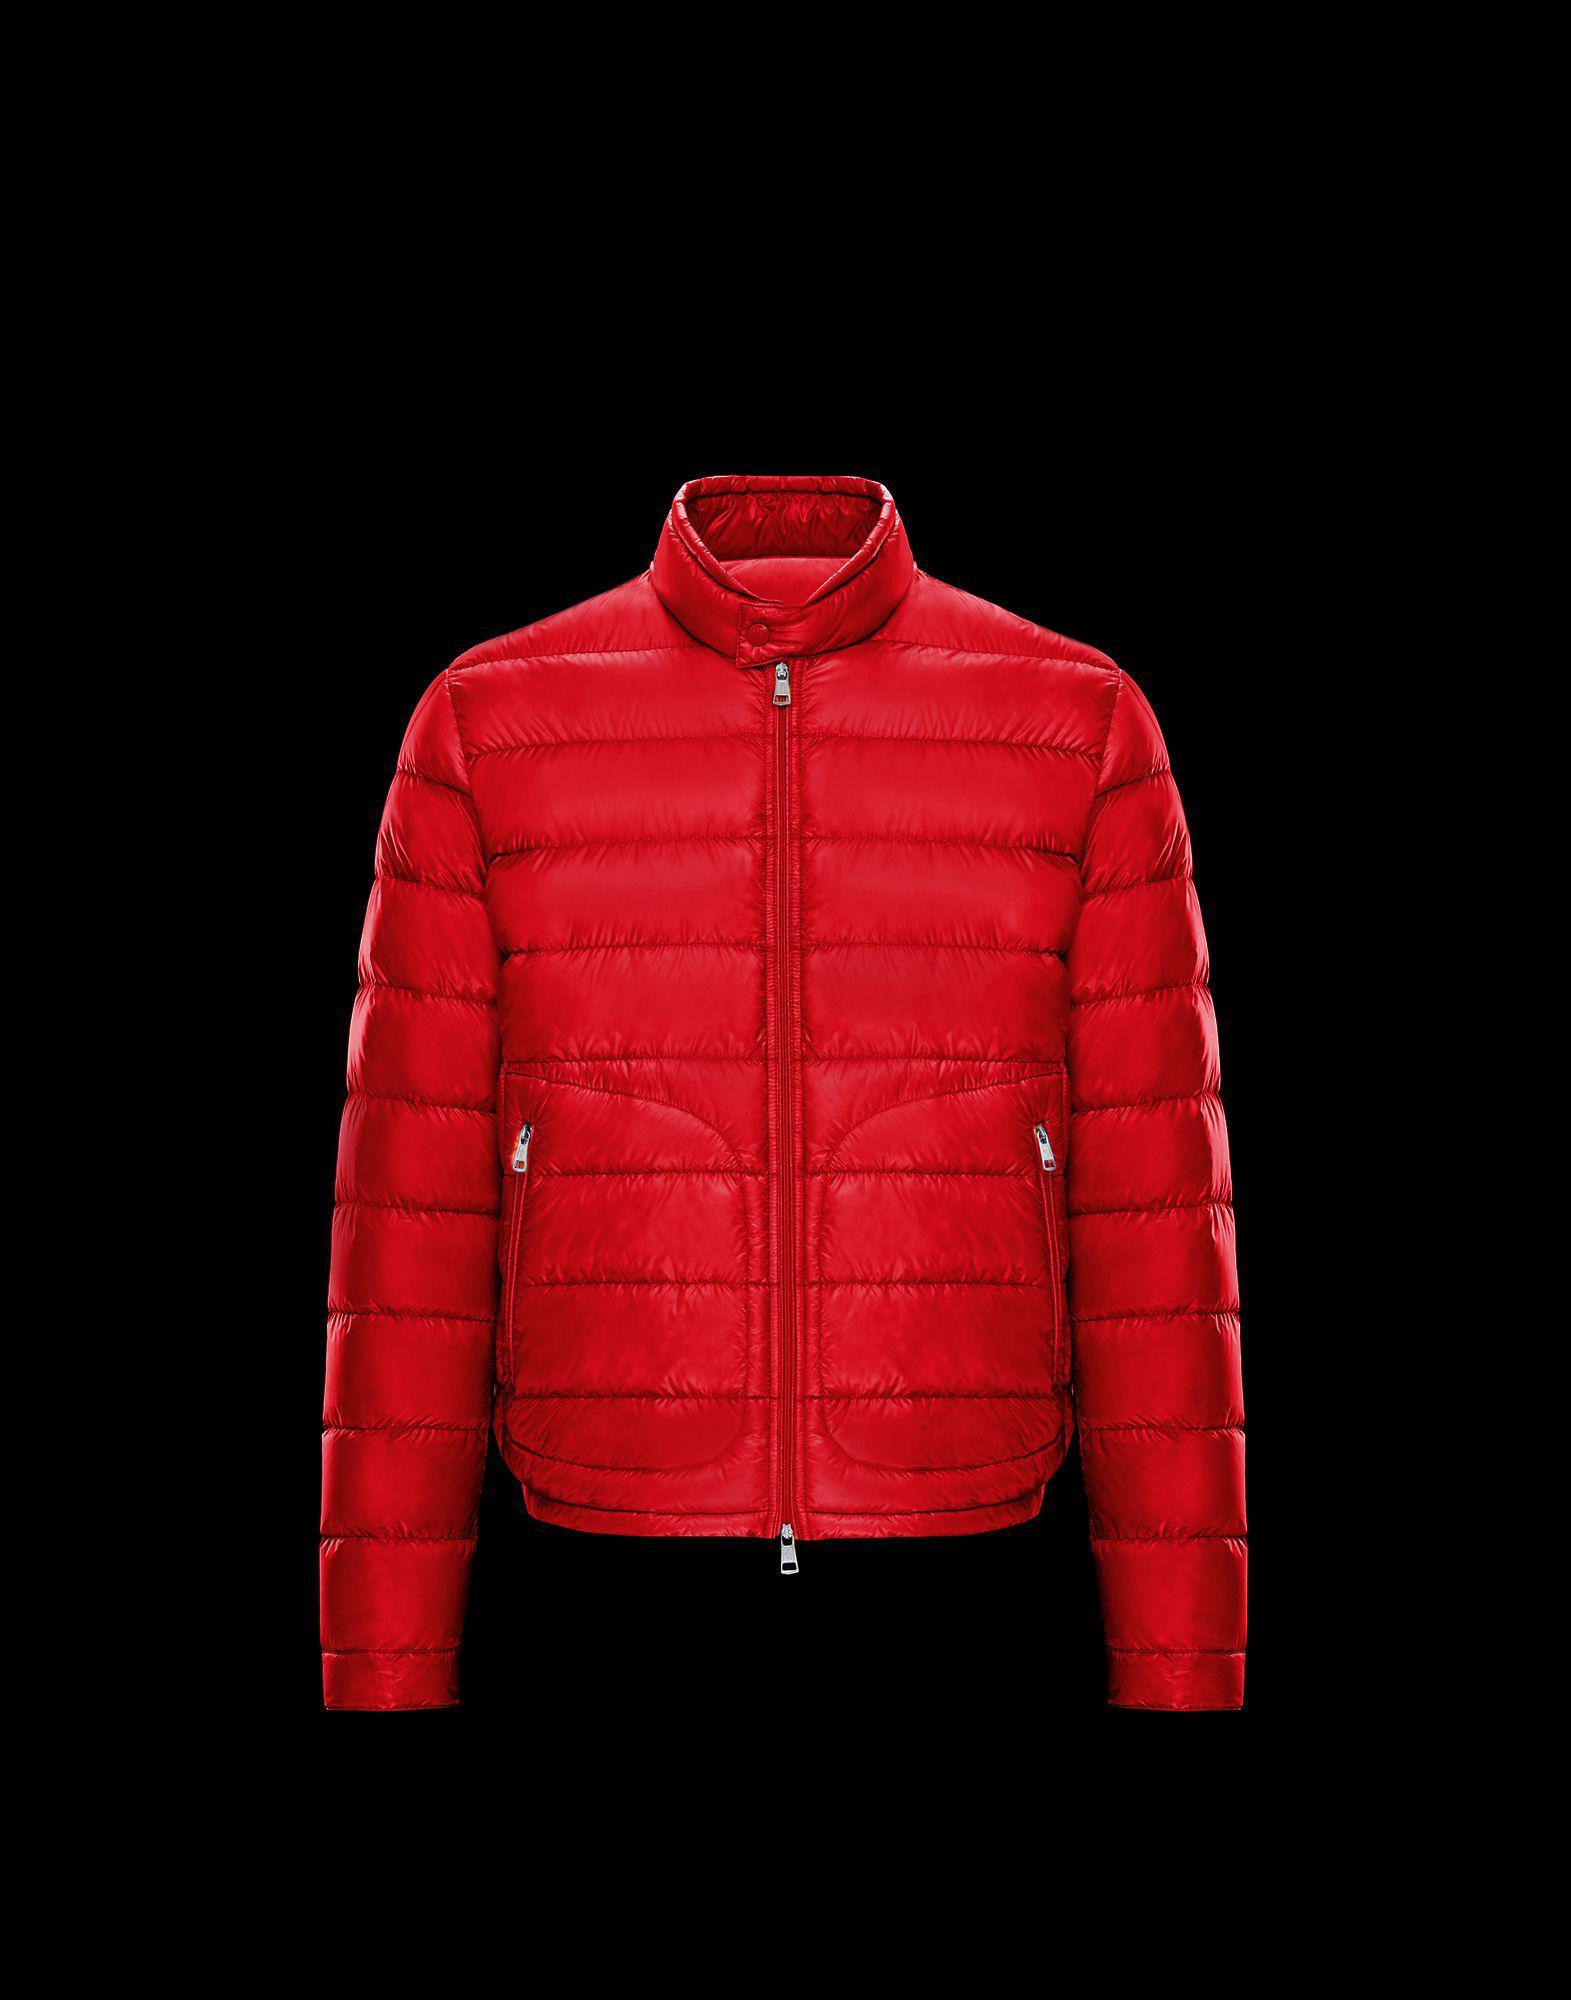 482c3edf4 Lyst - Moncler Acorus in Red for Men